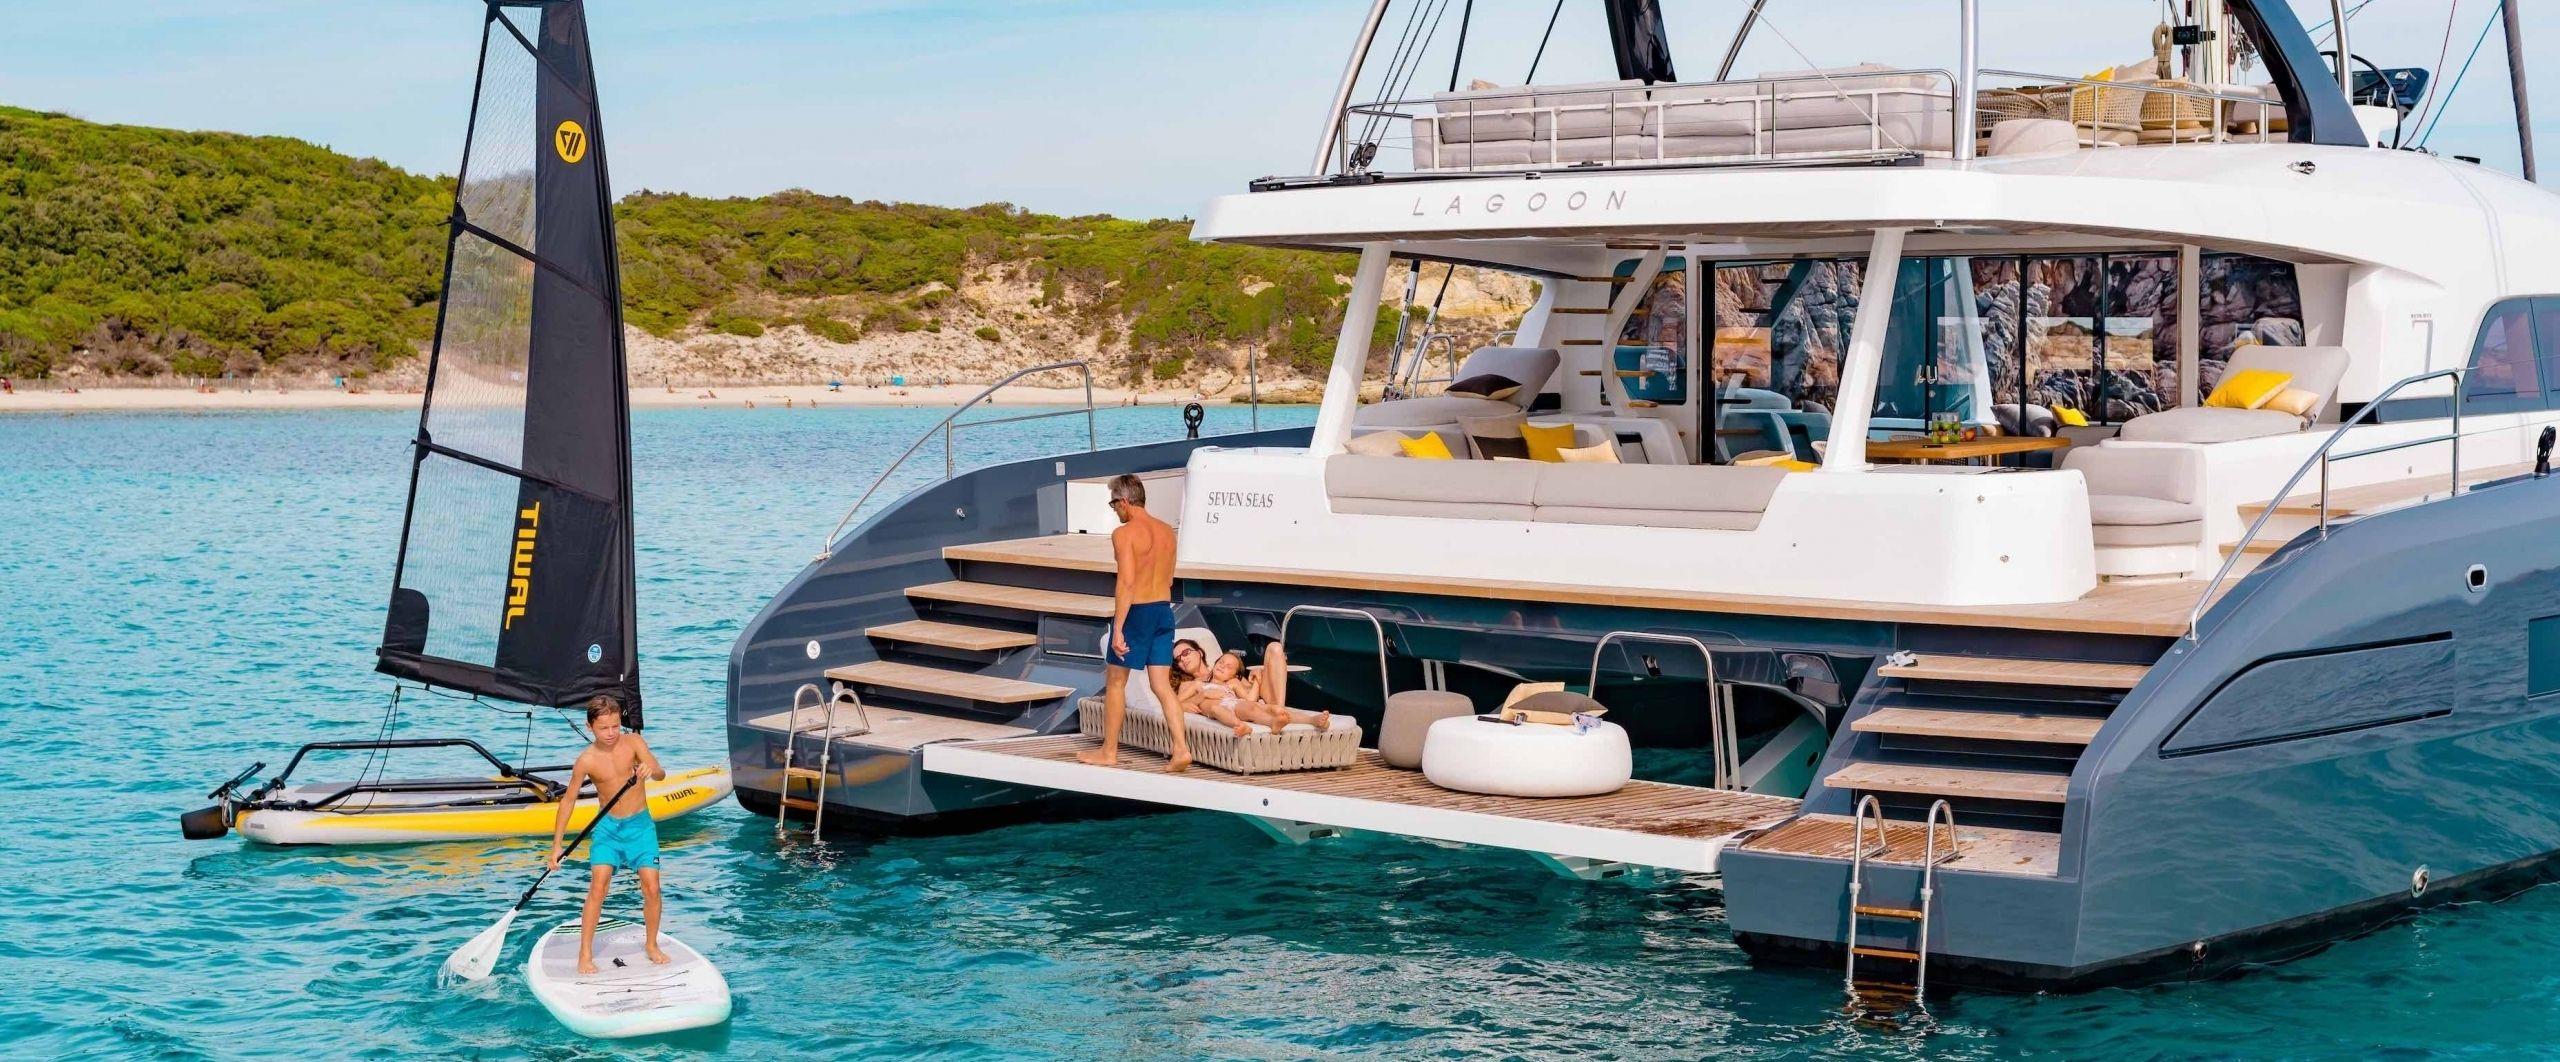 Lagoon Seventy 7 - Catamarans for sale